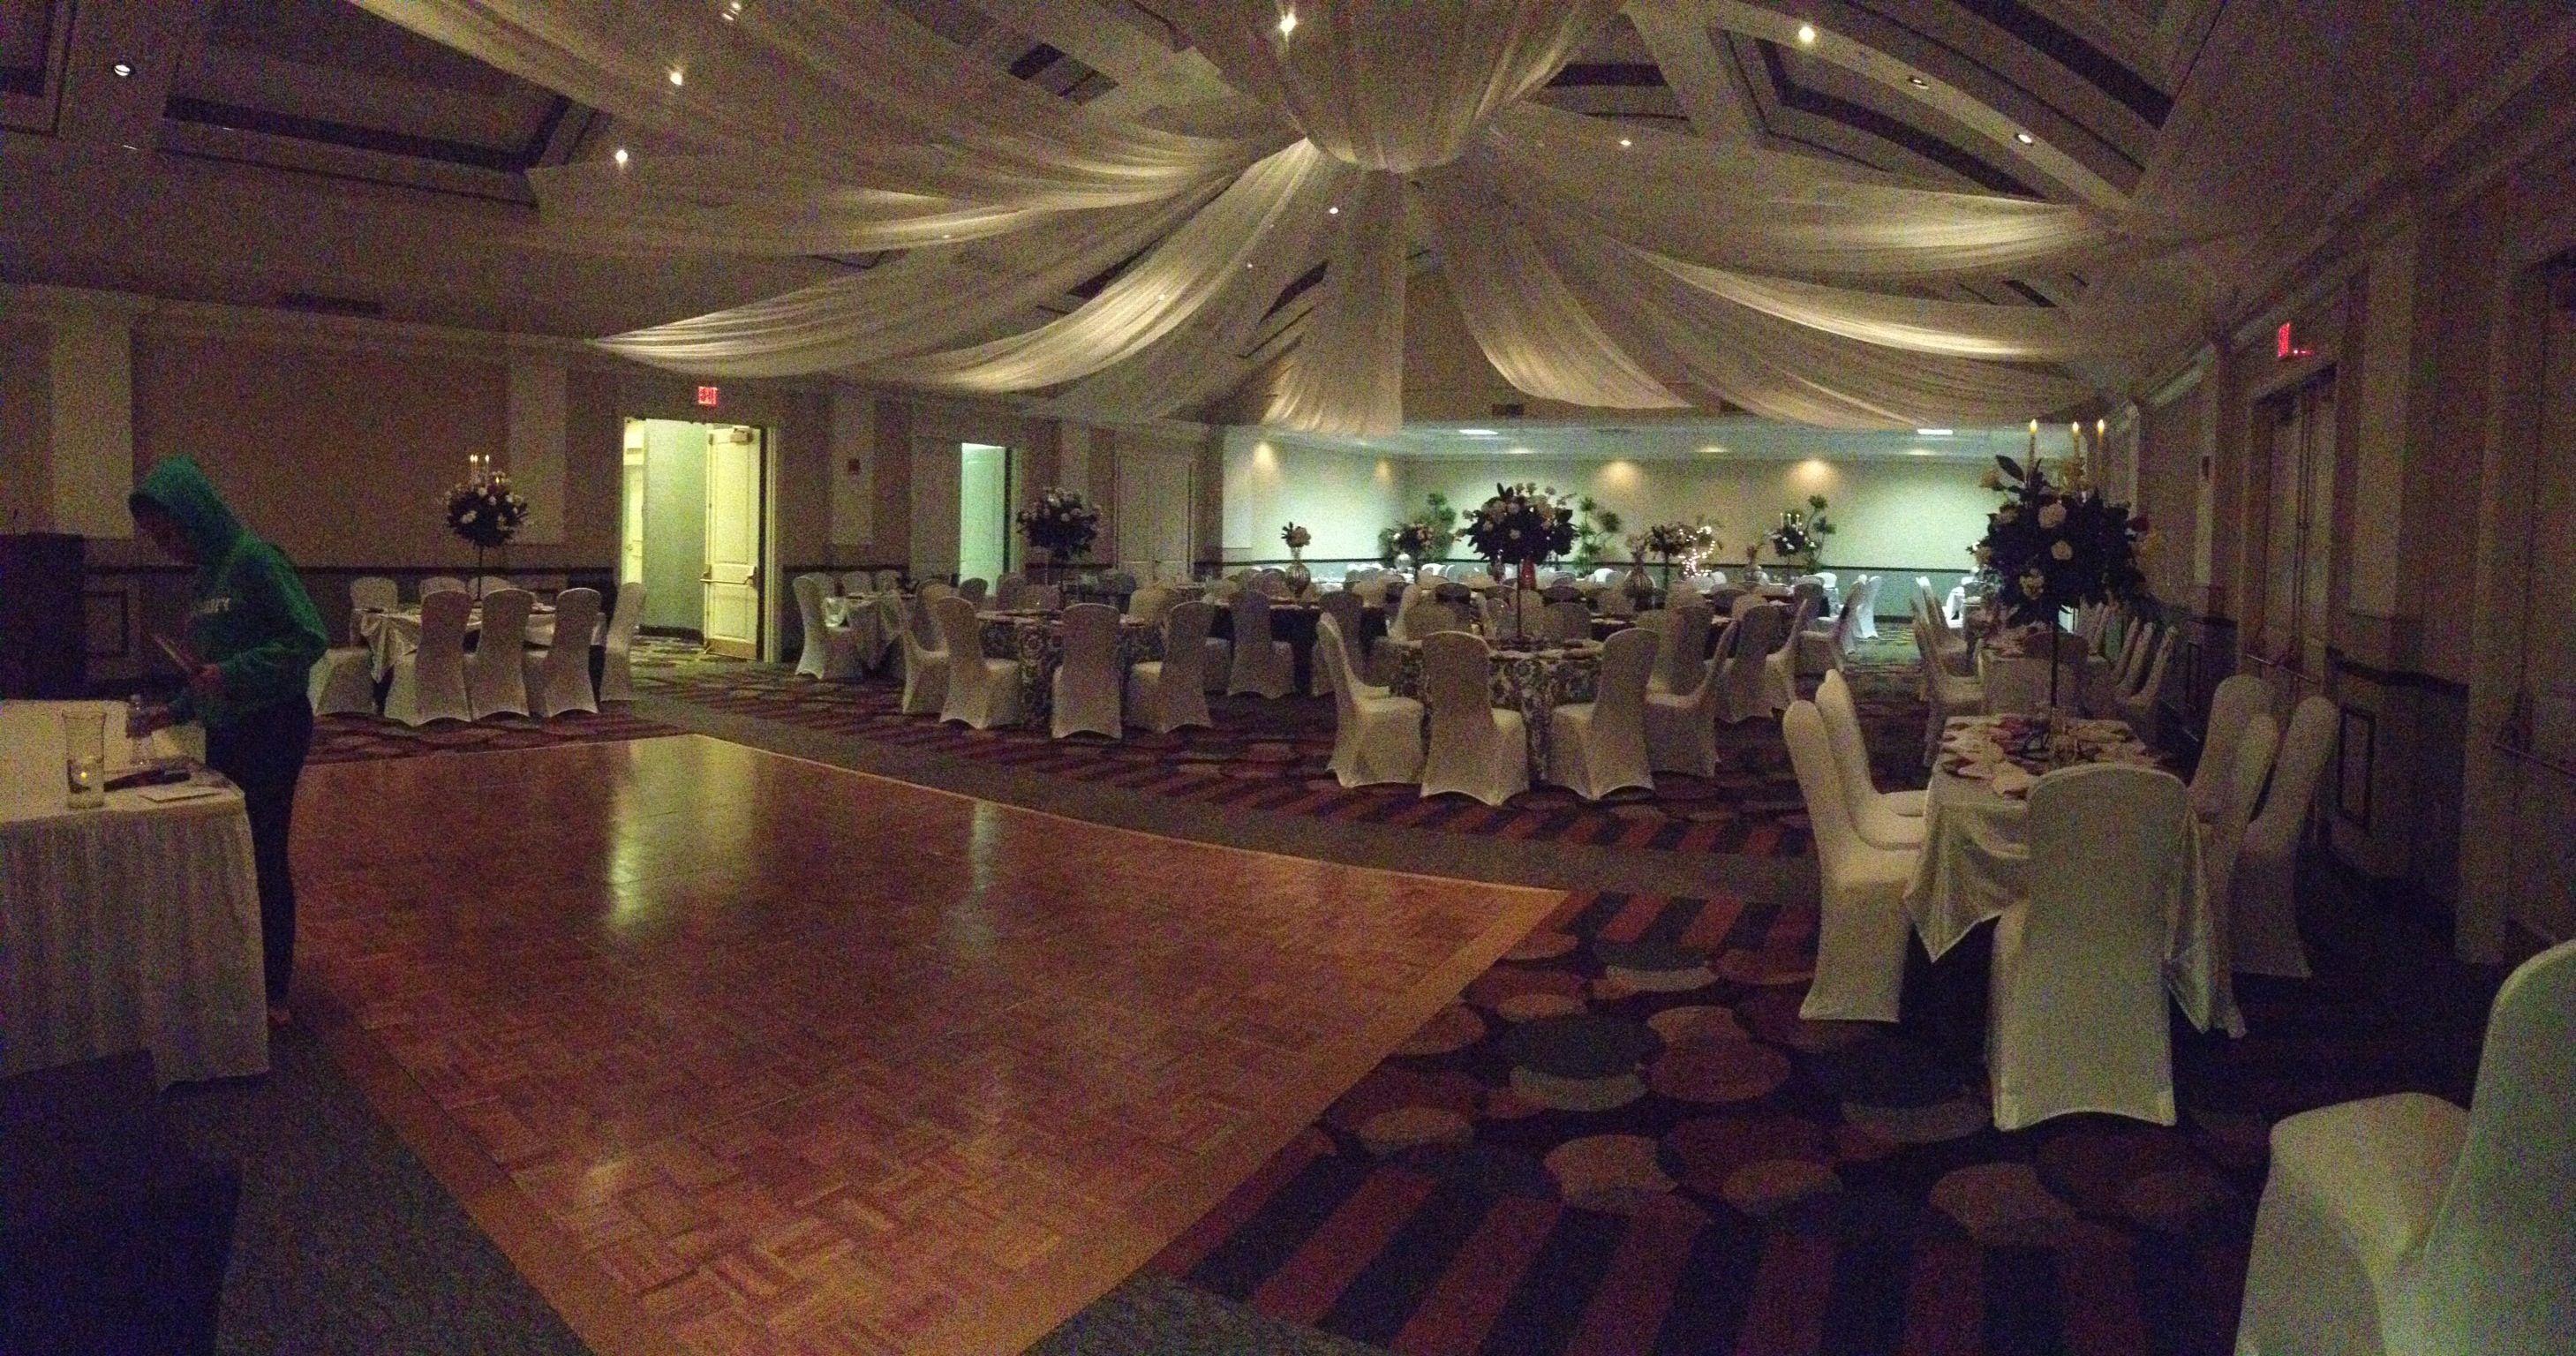 King edward hotel jacksonms weddings our property pinterest king edward hotel jacksonms weddings junglespirit Images